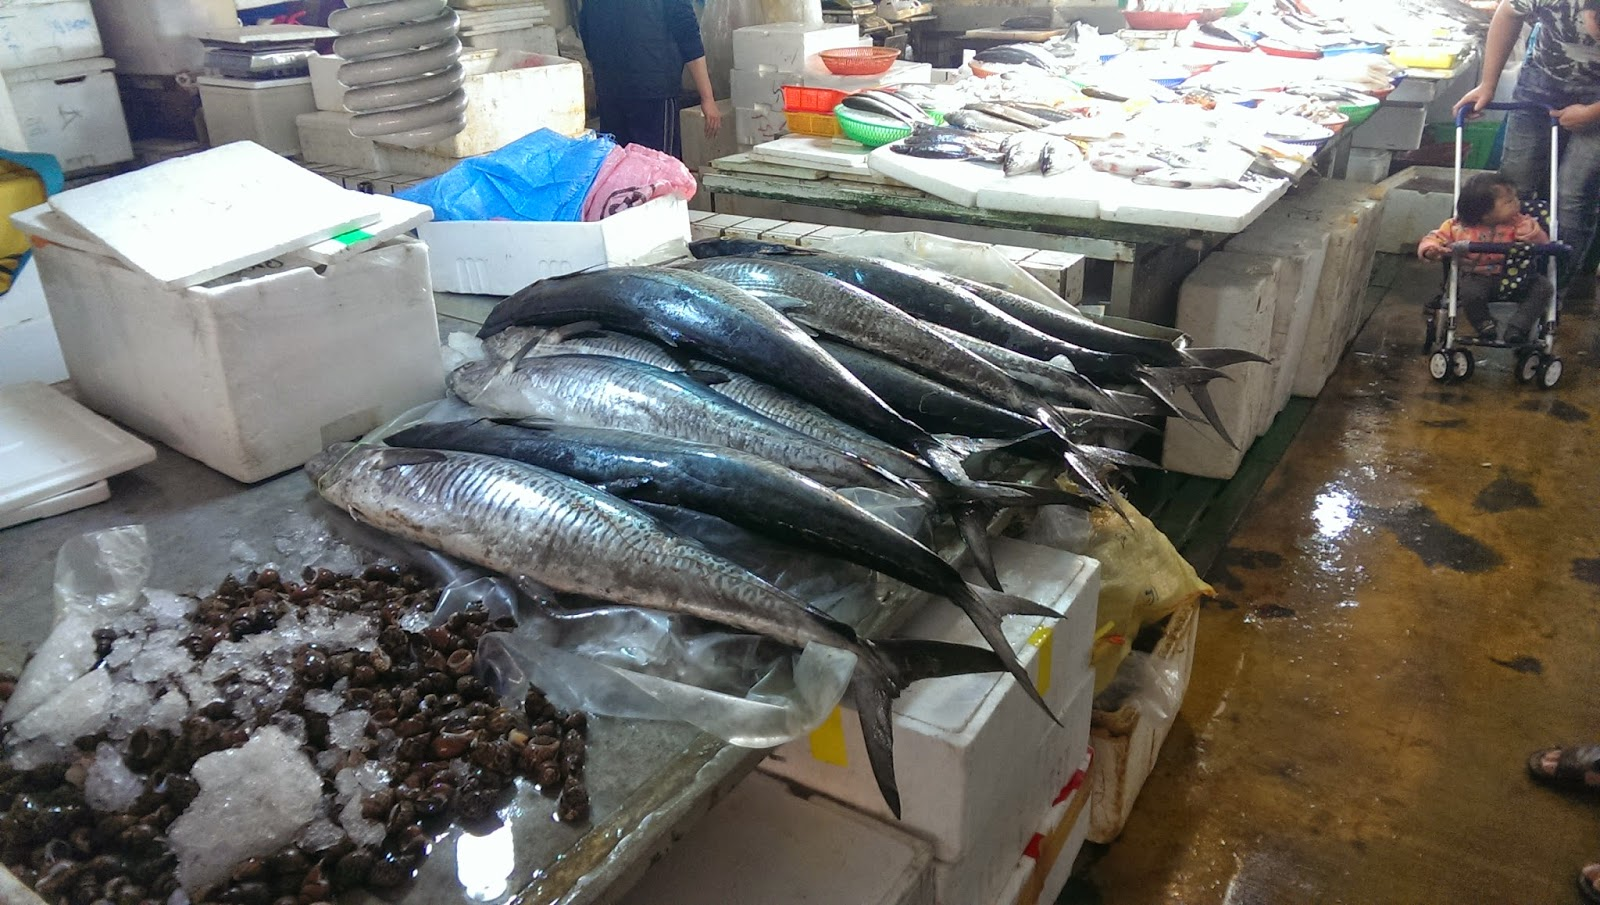 2015 02 02%2B11.58.03 - [食記] 葉家生魚片 - 布袋觀光漁市中的鮮魚餐廳